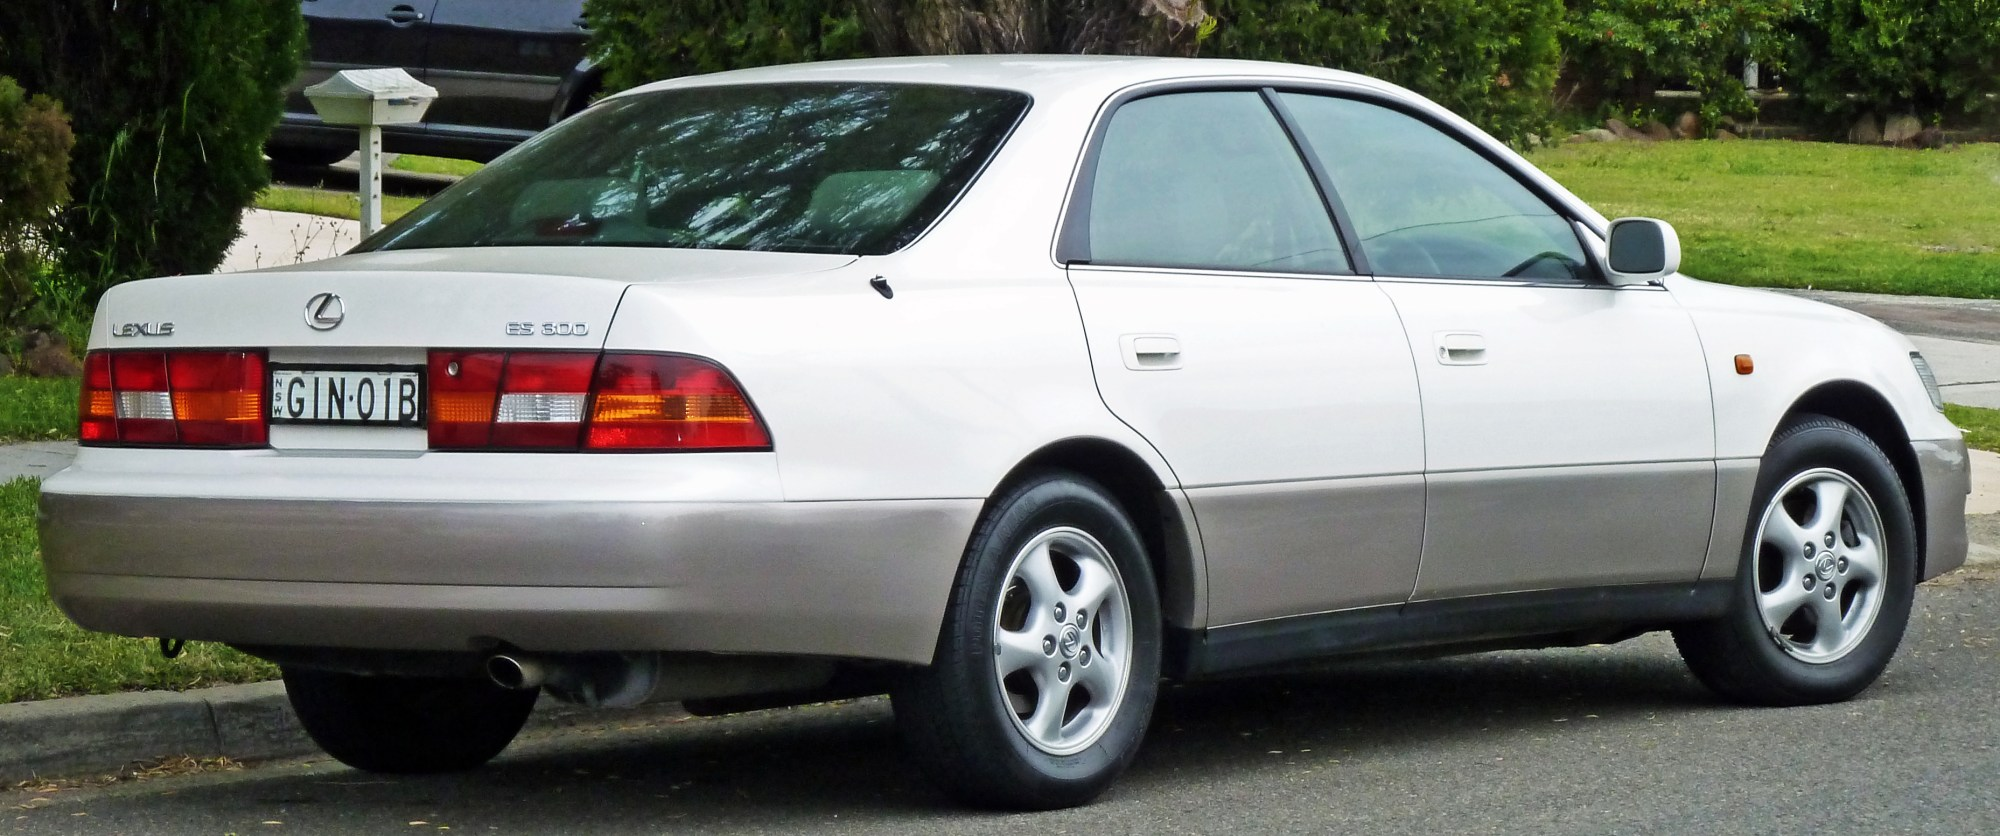 hight resolution of file 1996 1999 lexus es 300 mcv20r lxs sedan 03 jpg